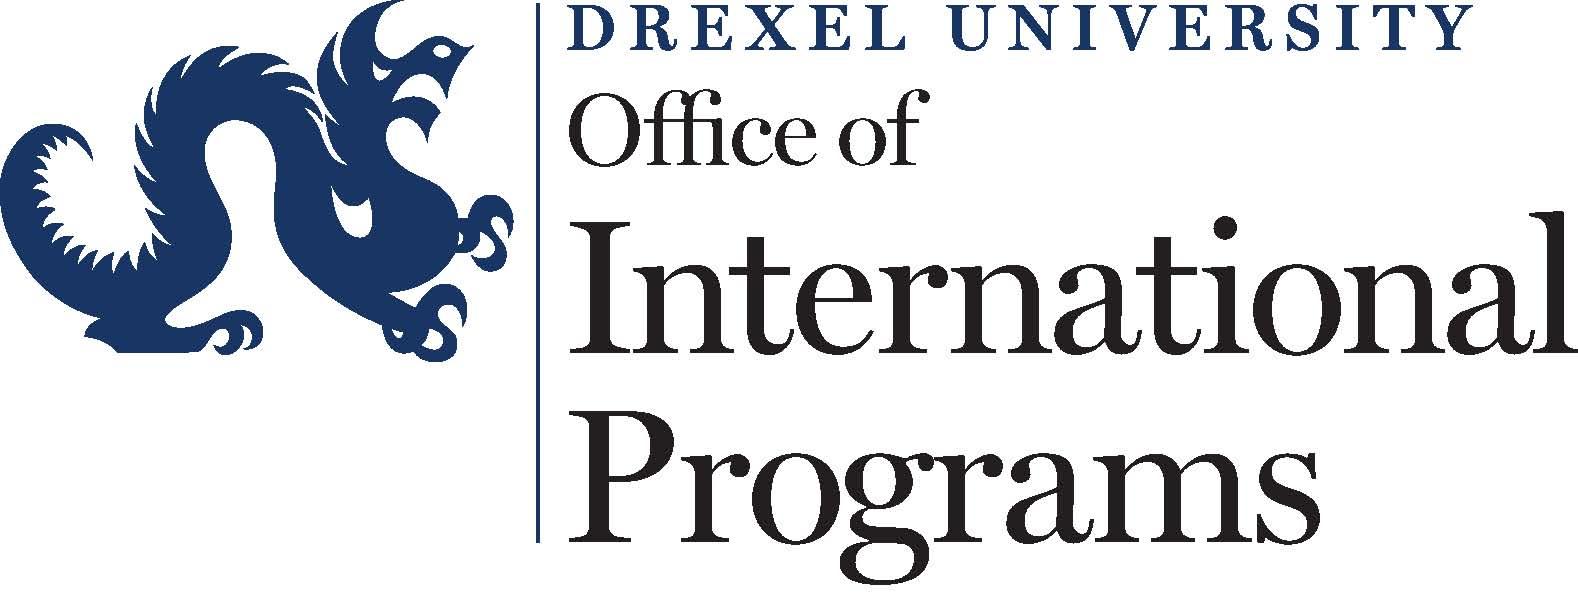 Drexel university office of international programs global interdependence center - International programs office ...